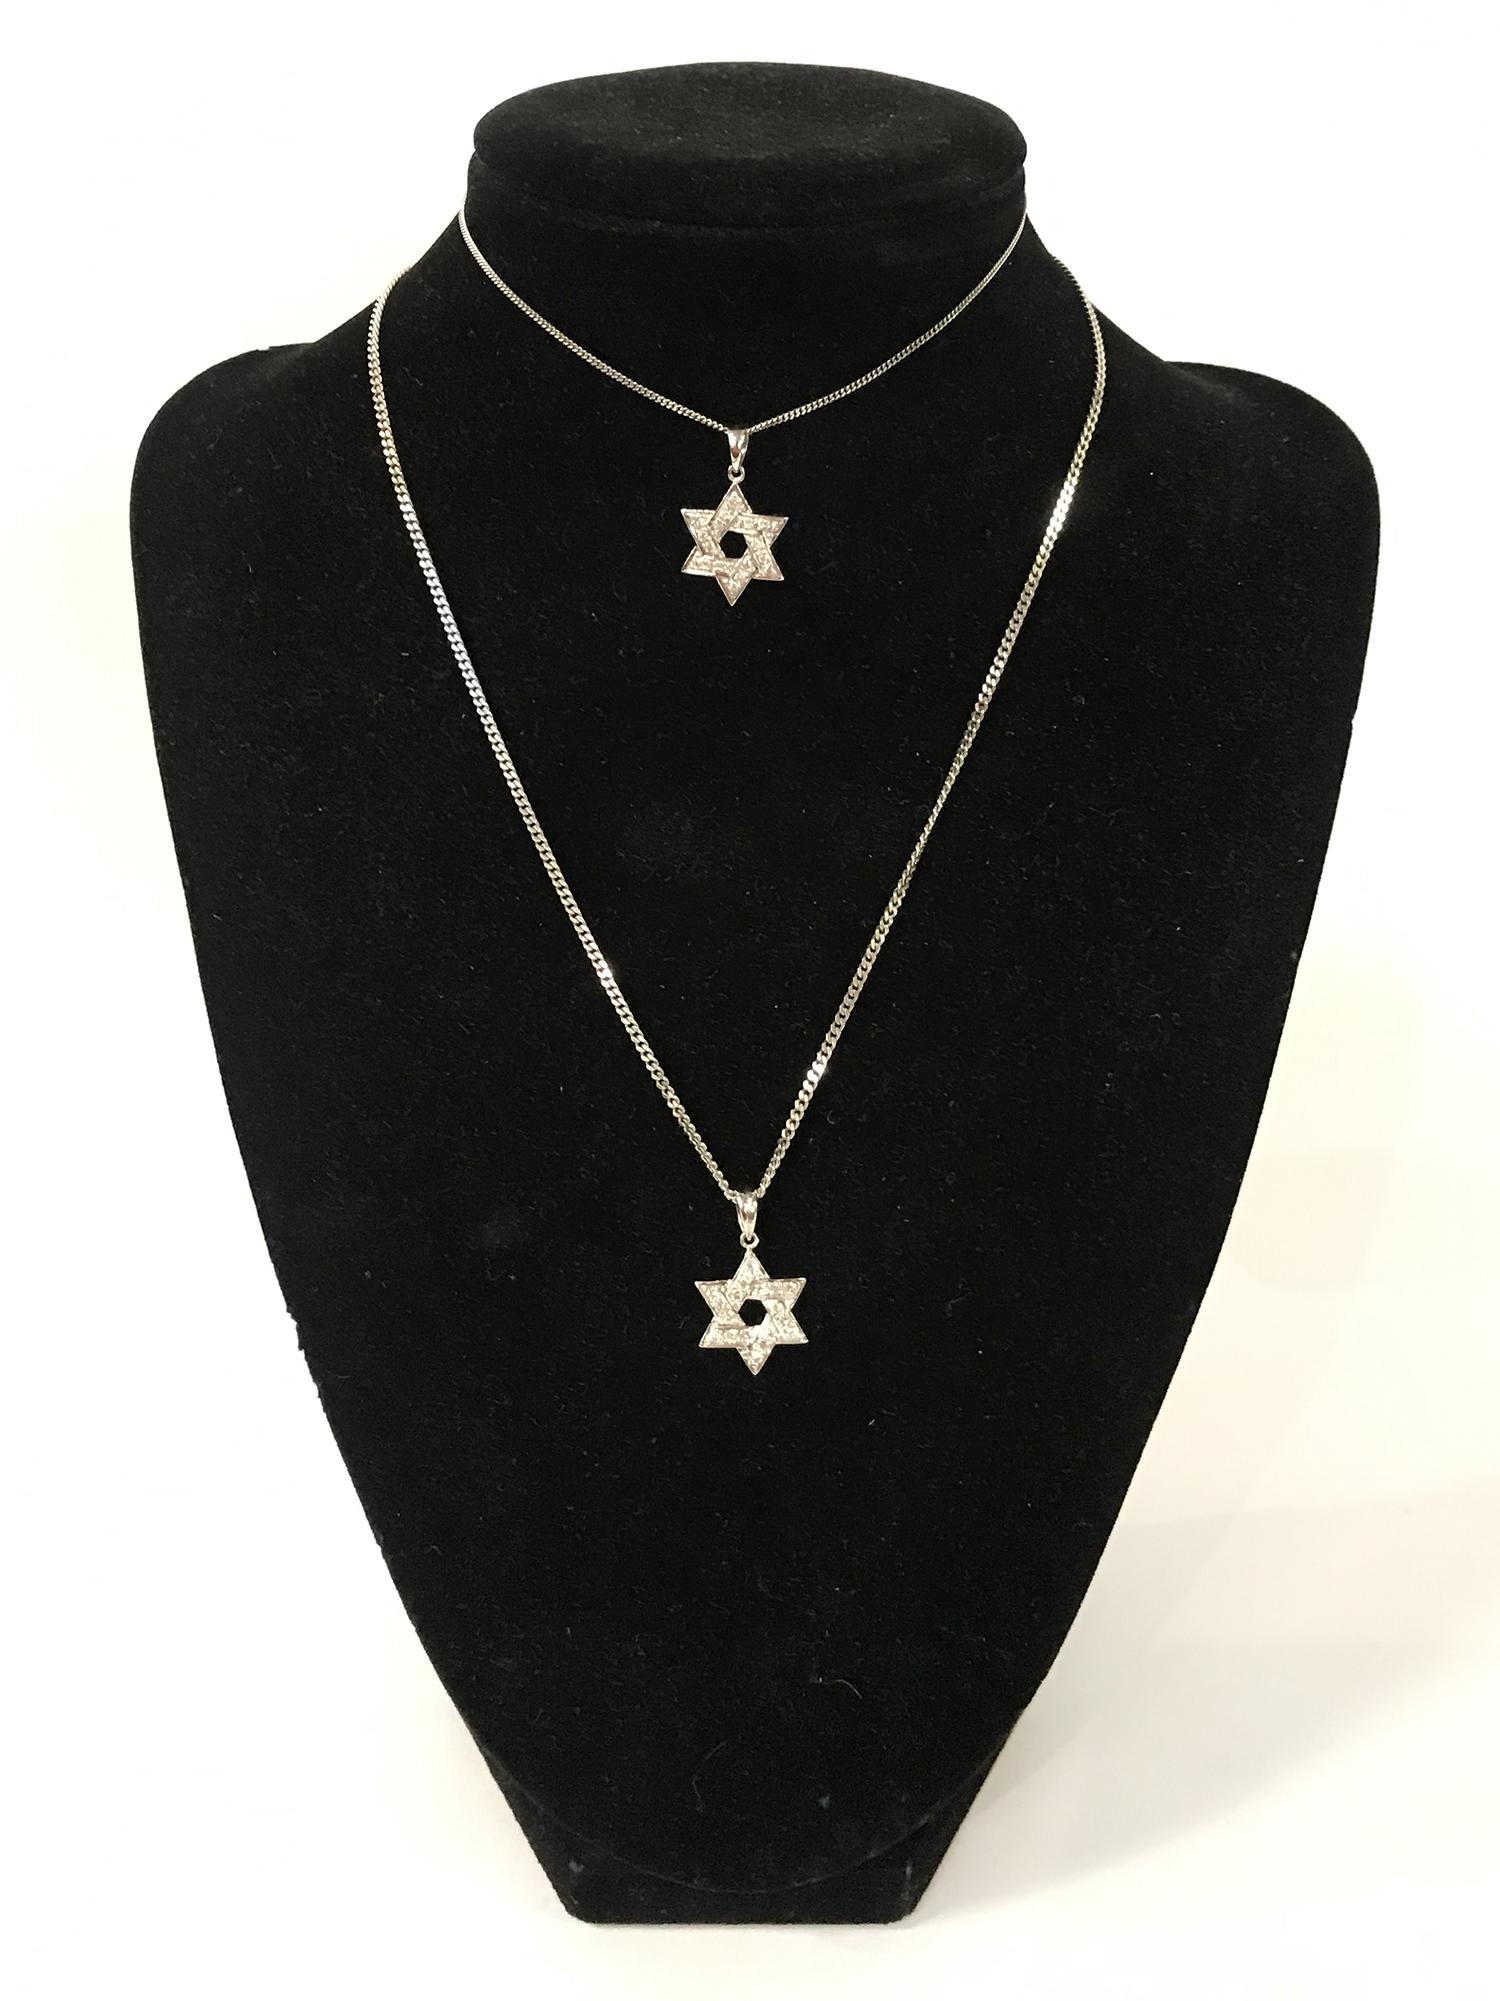 TWO 18CT GOLD DIAMOND STAR OF DAVID PENDANTS WITH ONE 18CT GOLD CHAIN & ONE 9CT GOLD CHAIN